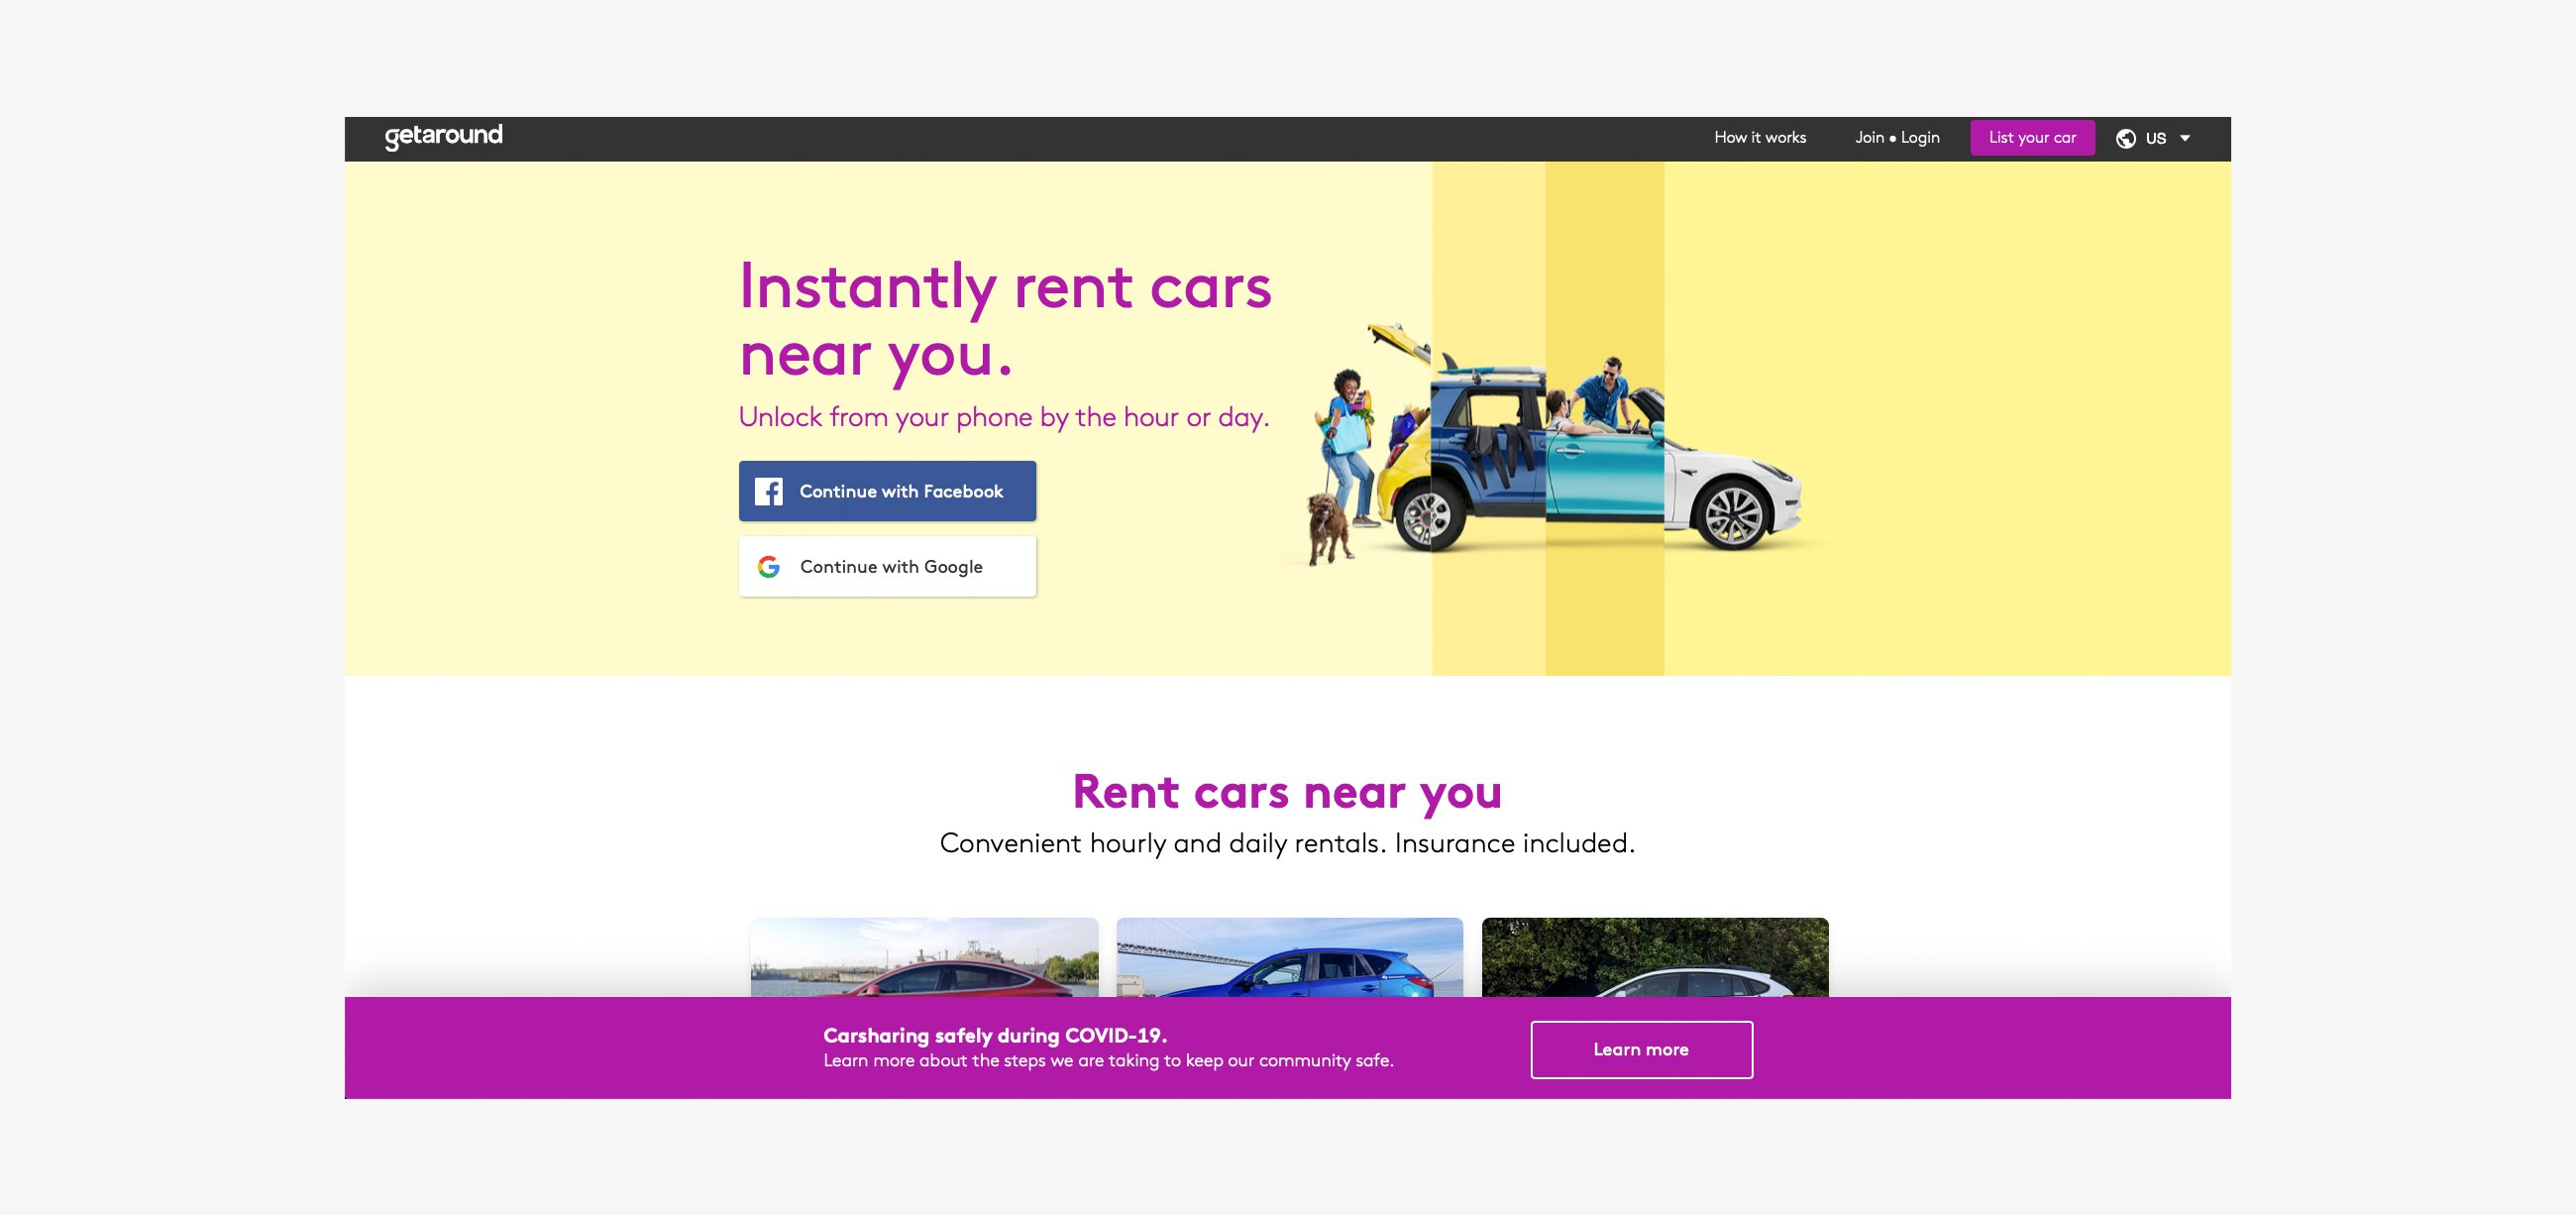 Getaround- Companies in San Francisco